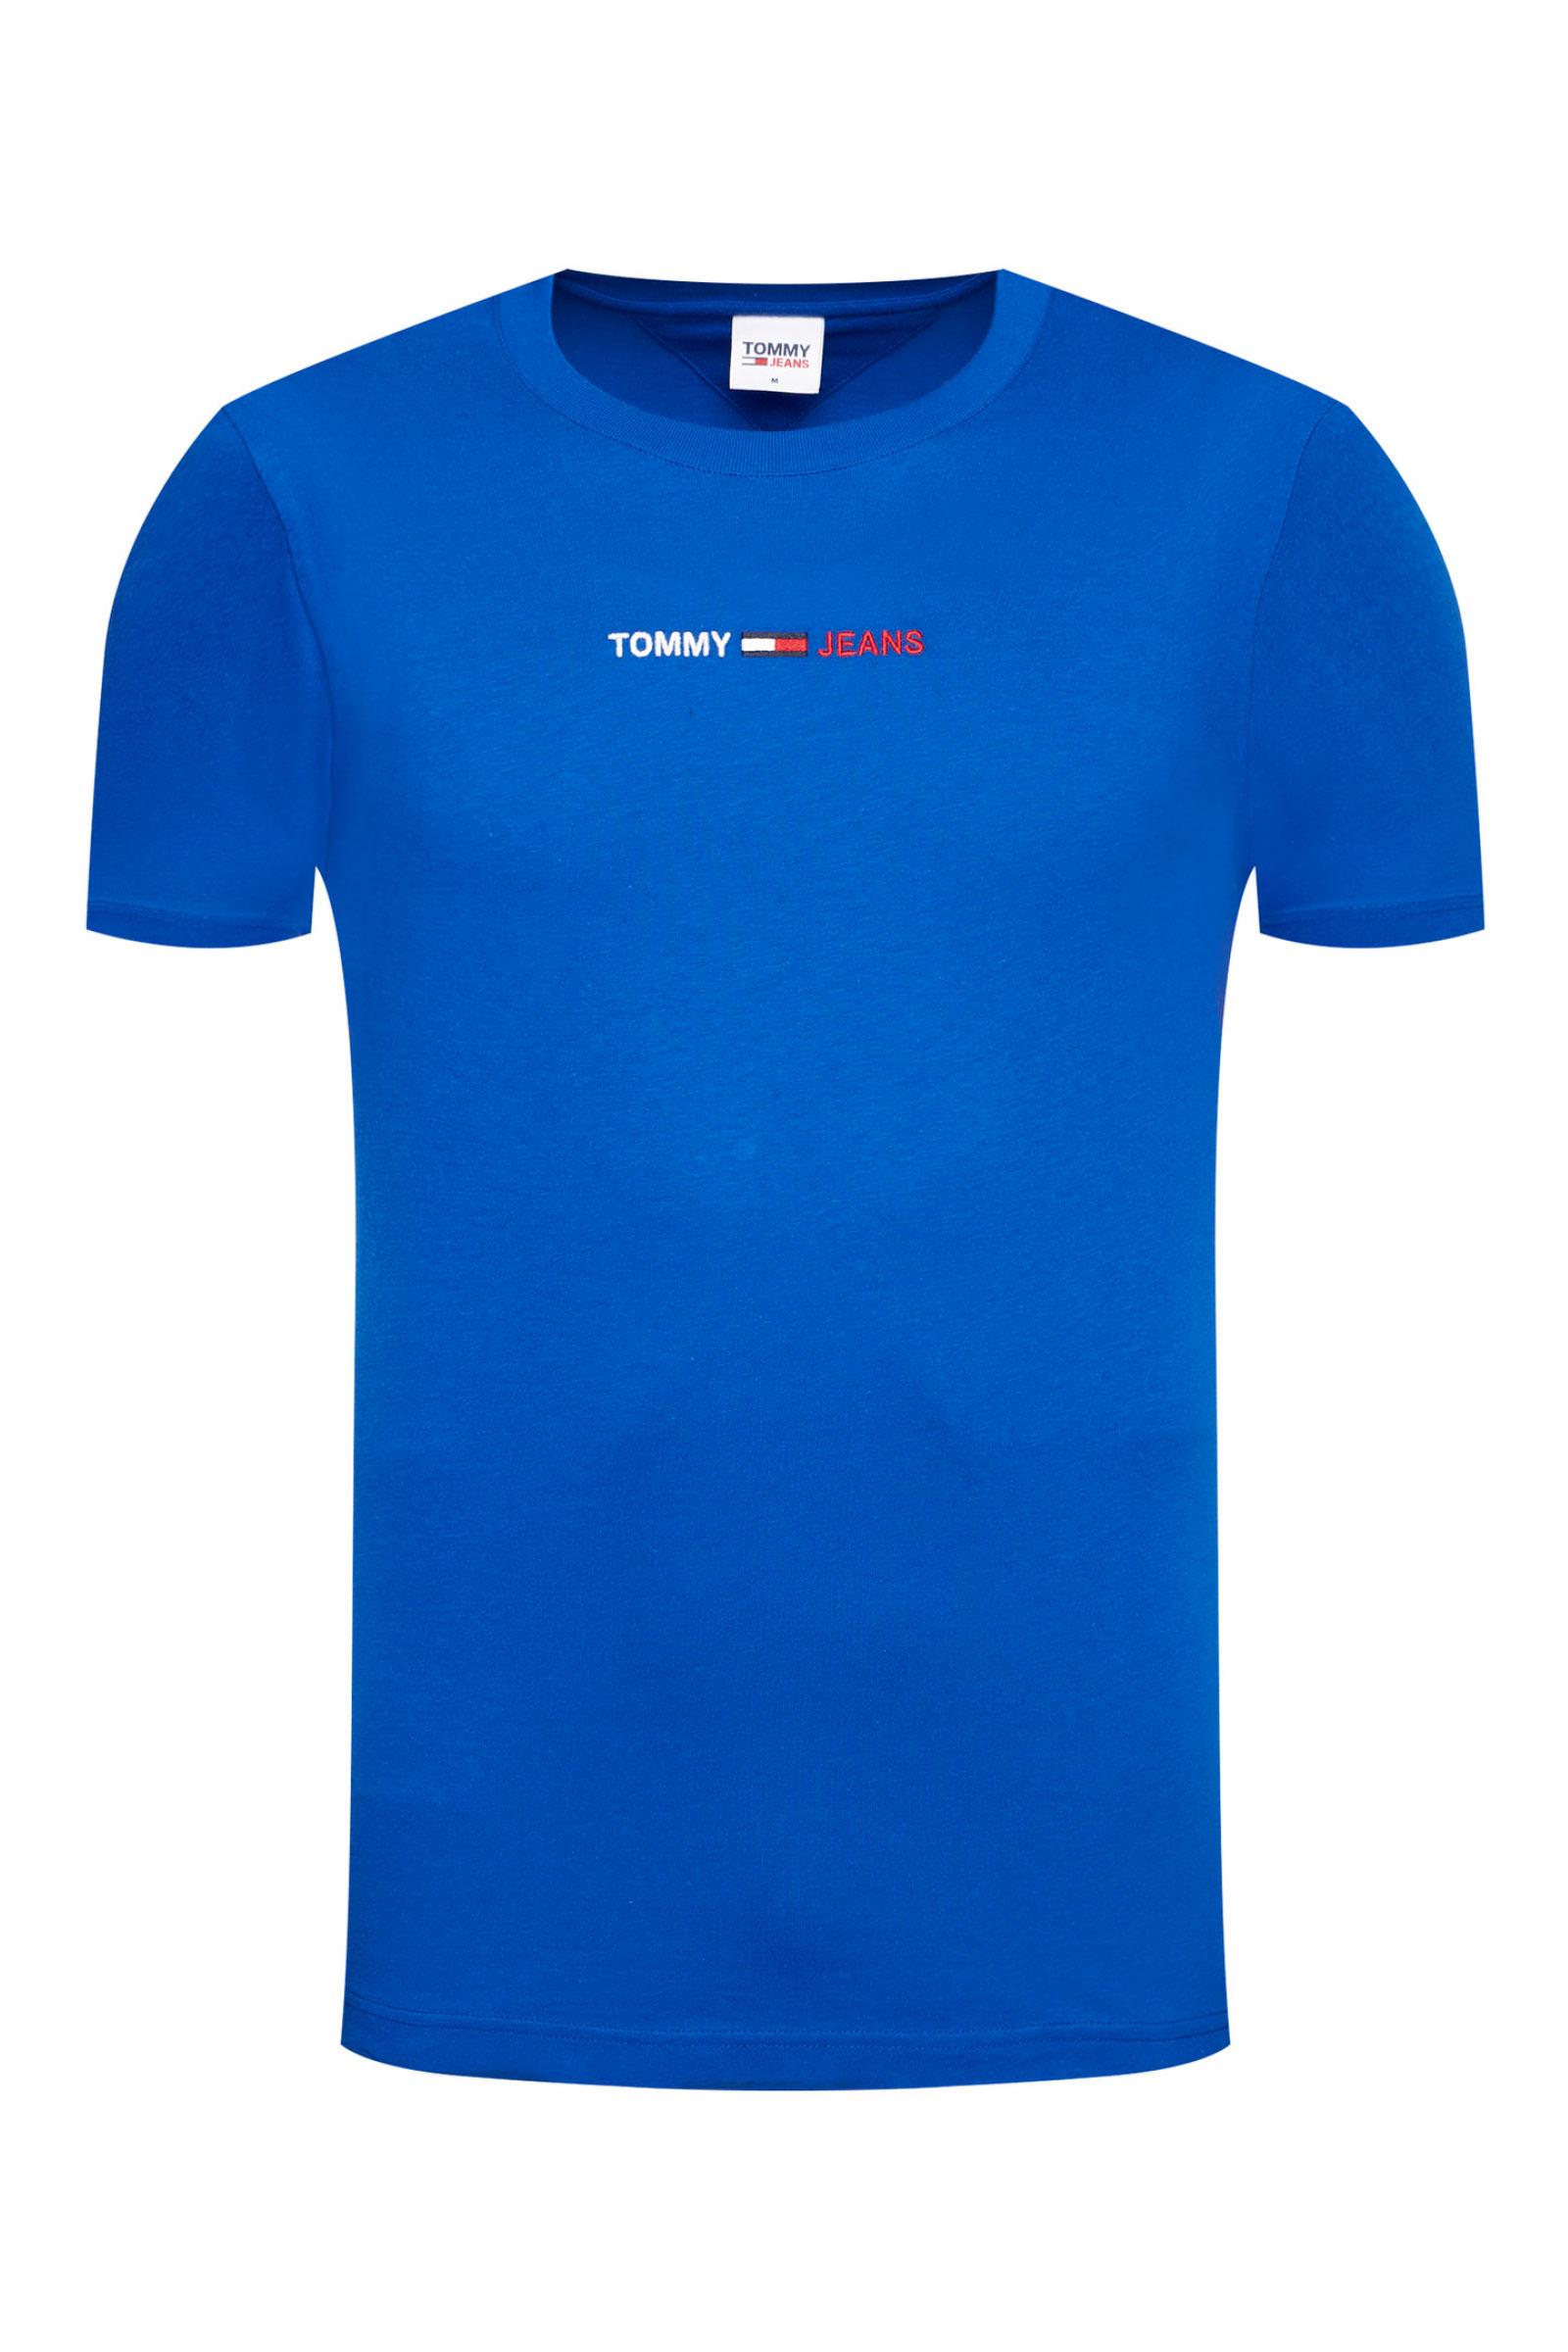 TOMMY JEANS T-Shirt Uomo TOMMY JEANS   T-Shirt   DM0DM10219C65